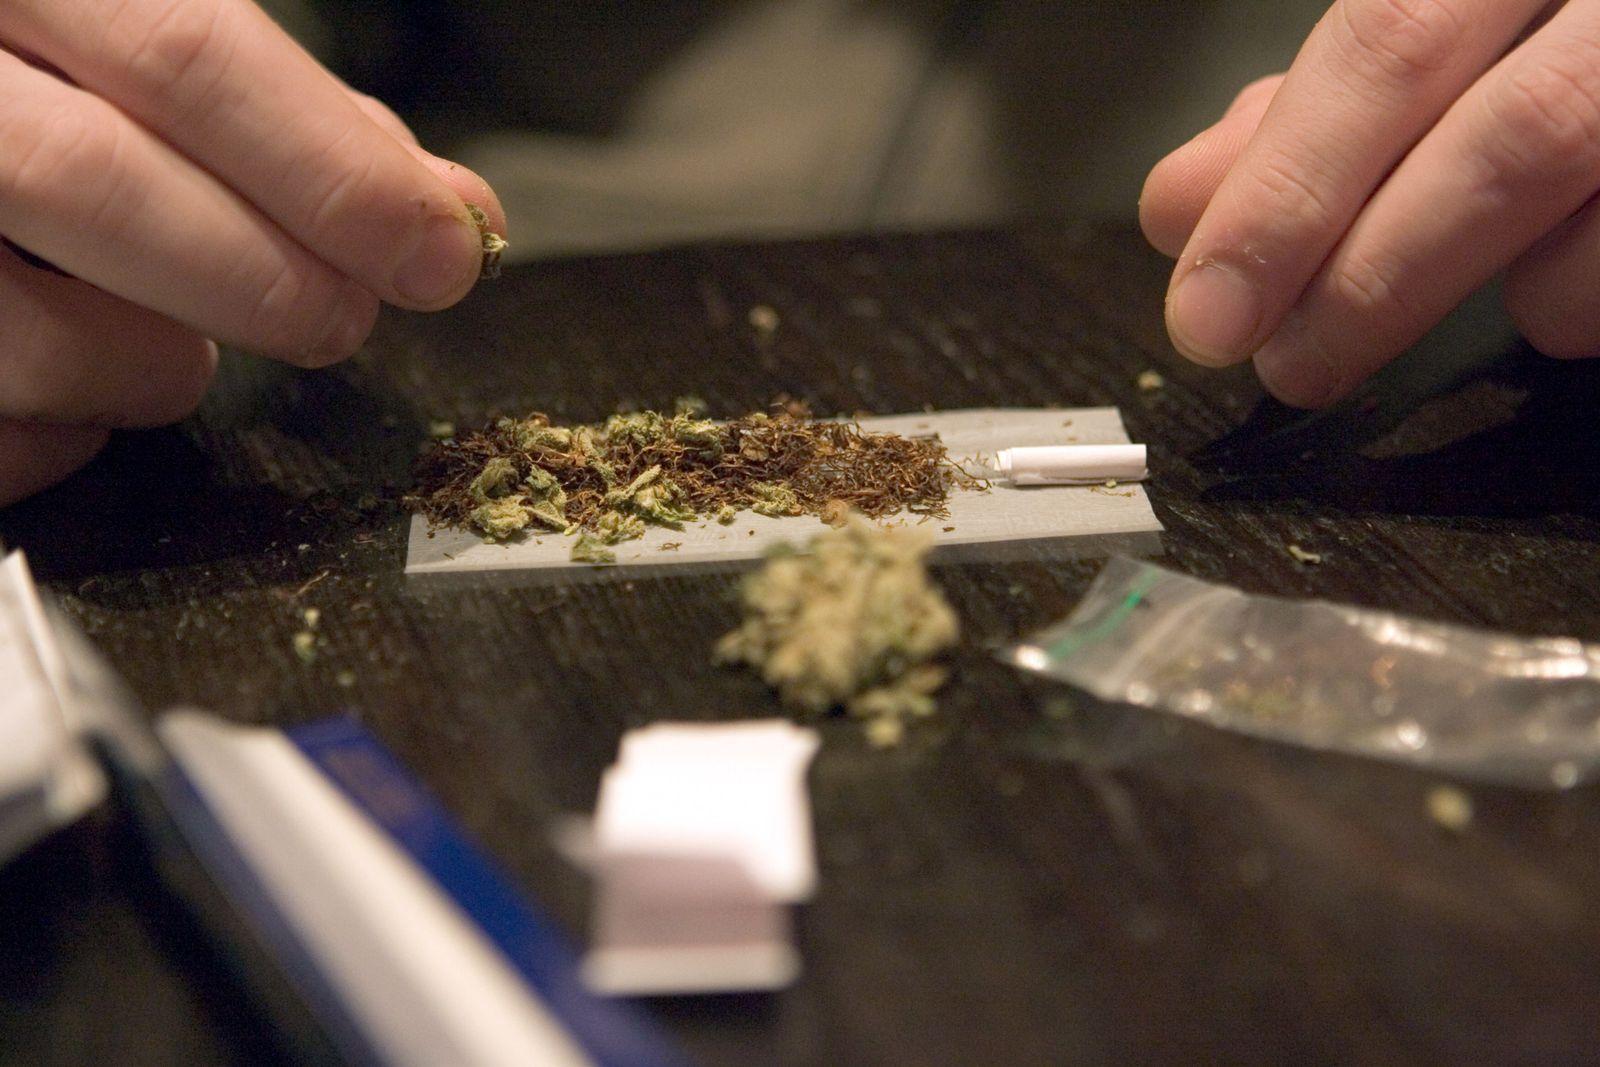 Coffeeshop in den Niederlanden / Joint bauen / Kiffen / Marihuana